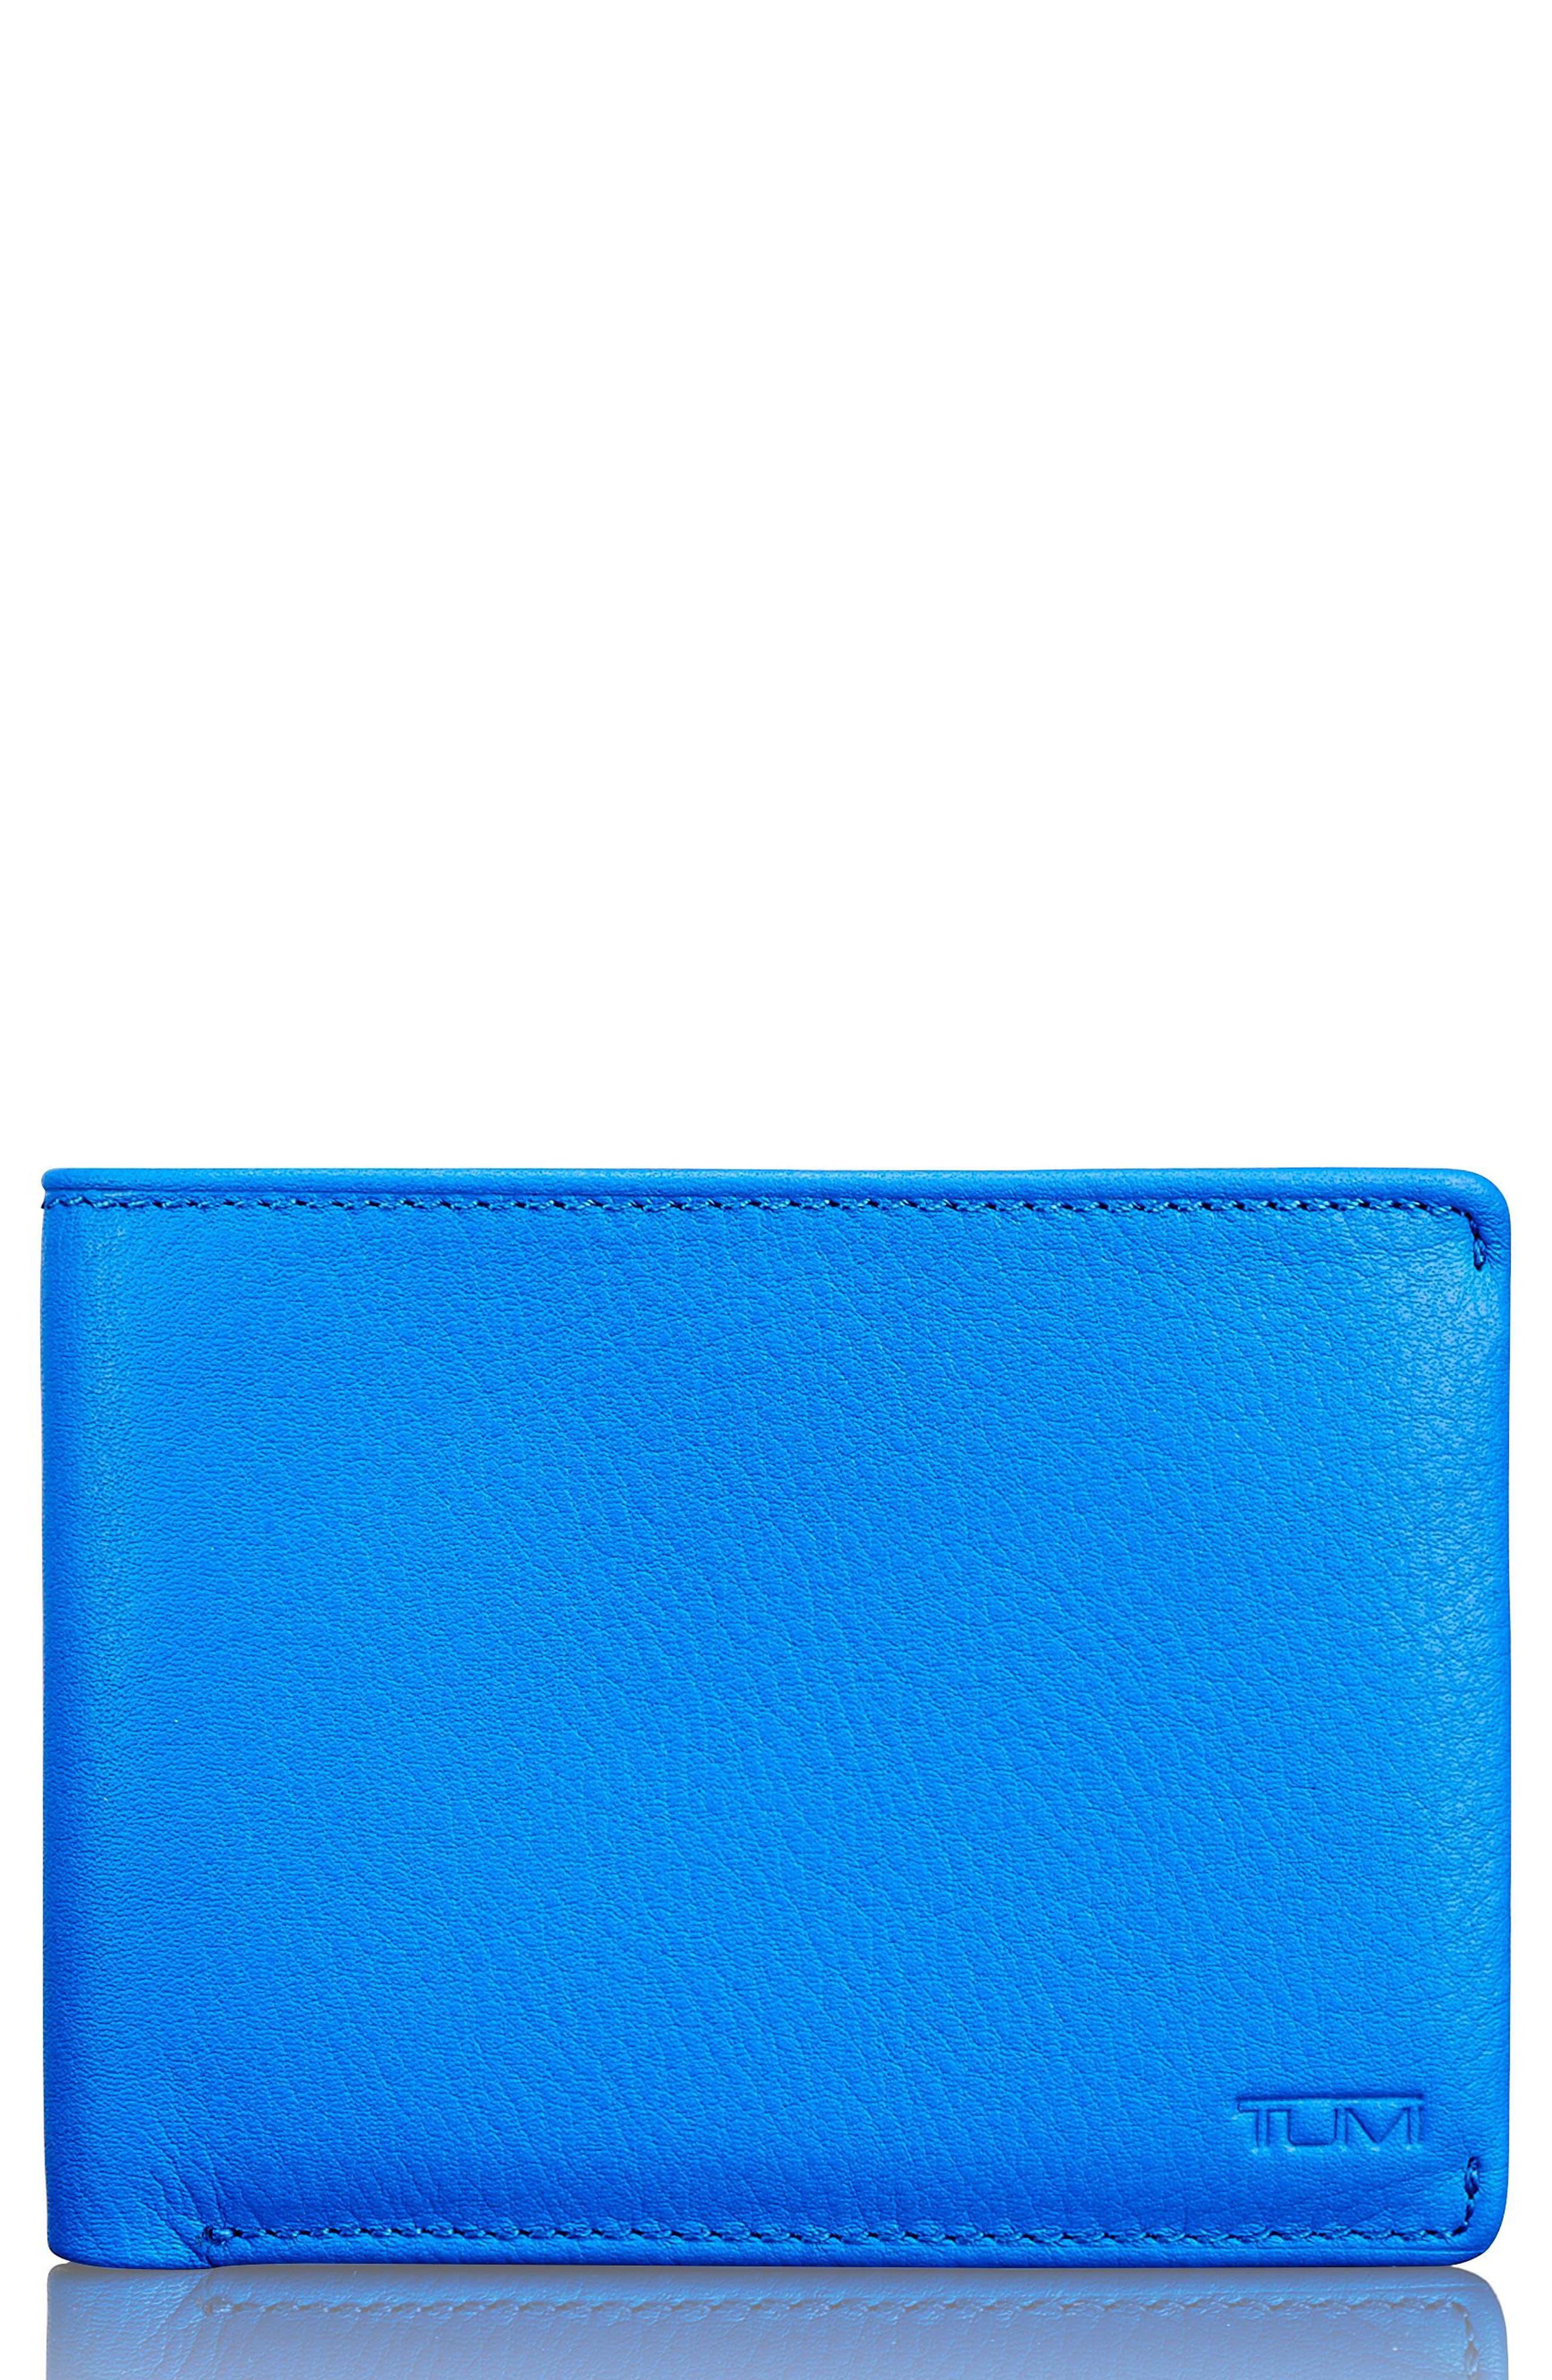 Main Image - Tumi Leather Wallet